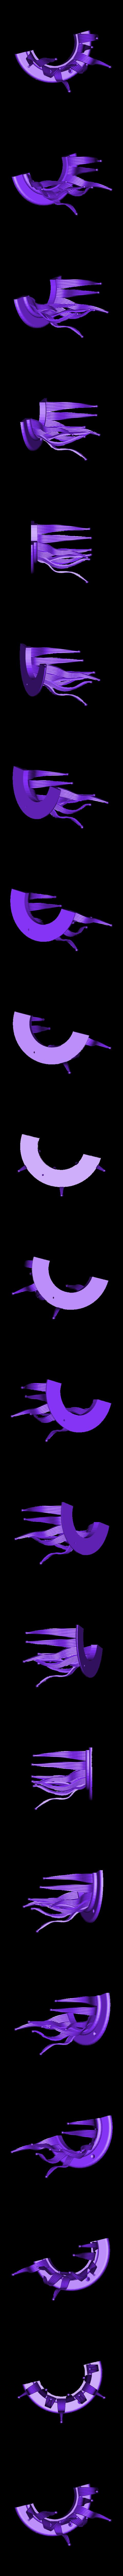 Base_leaves_half_B.stl Download free STL file Chandelier Iris • 3D printer design, Opossums